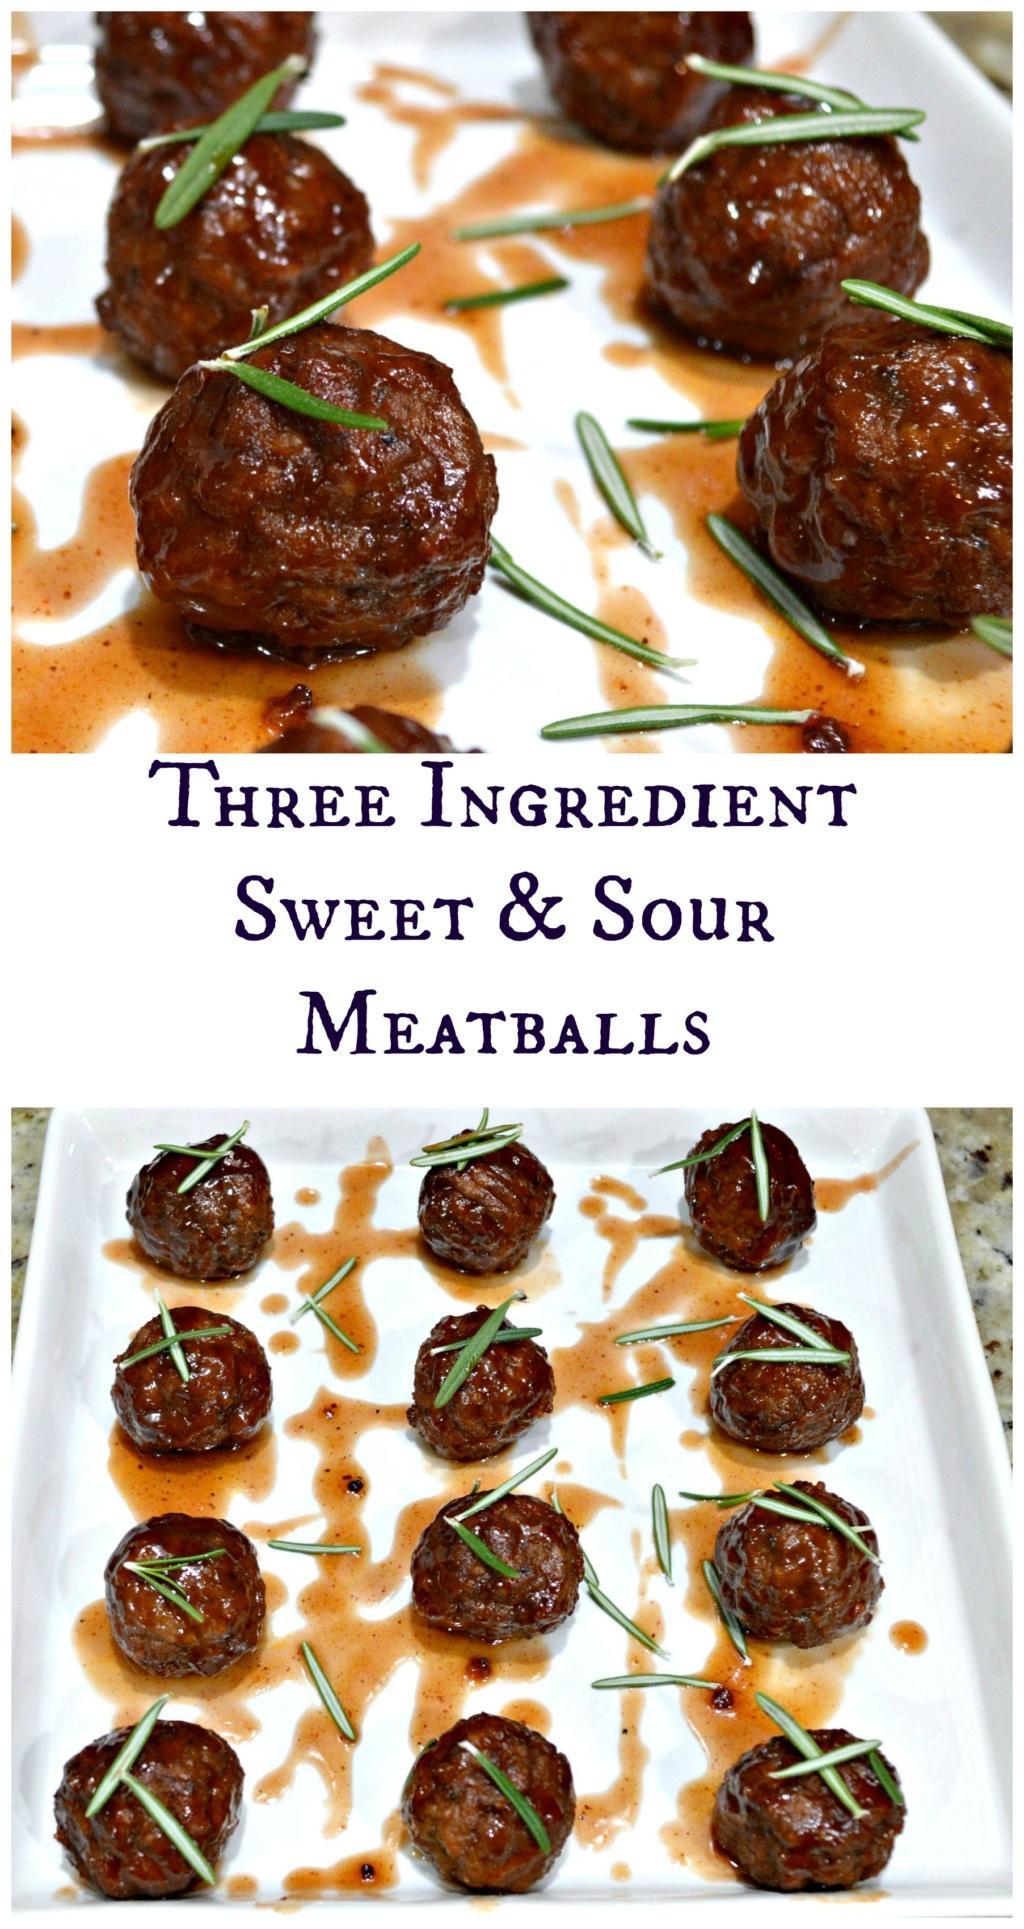 Three Ingredient Sweet & Sour Meatballs